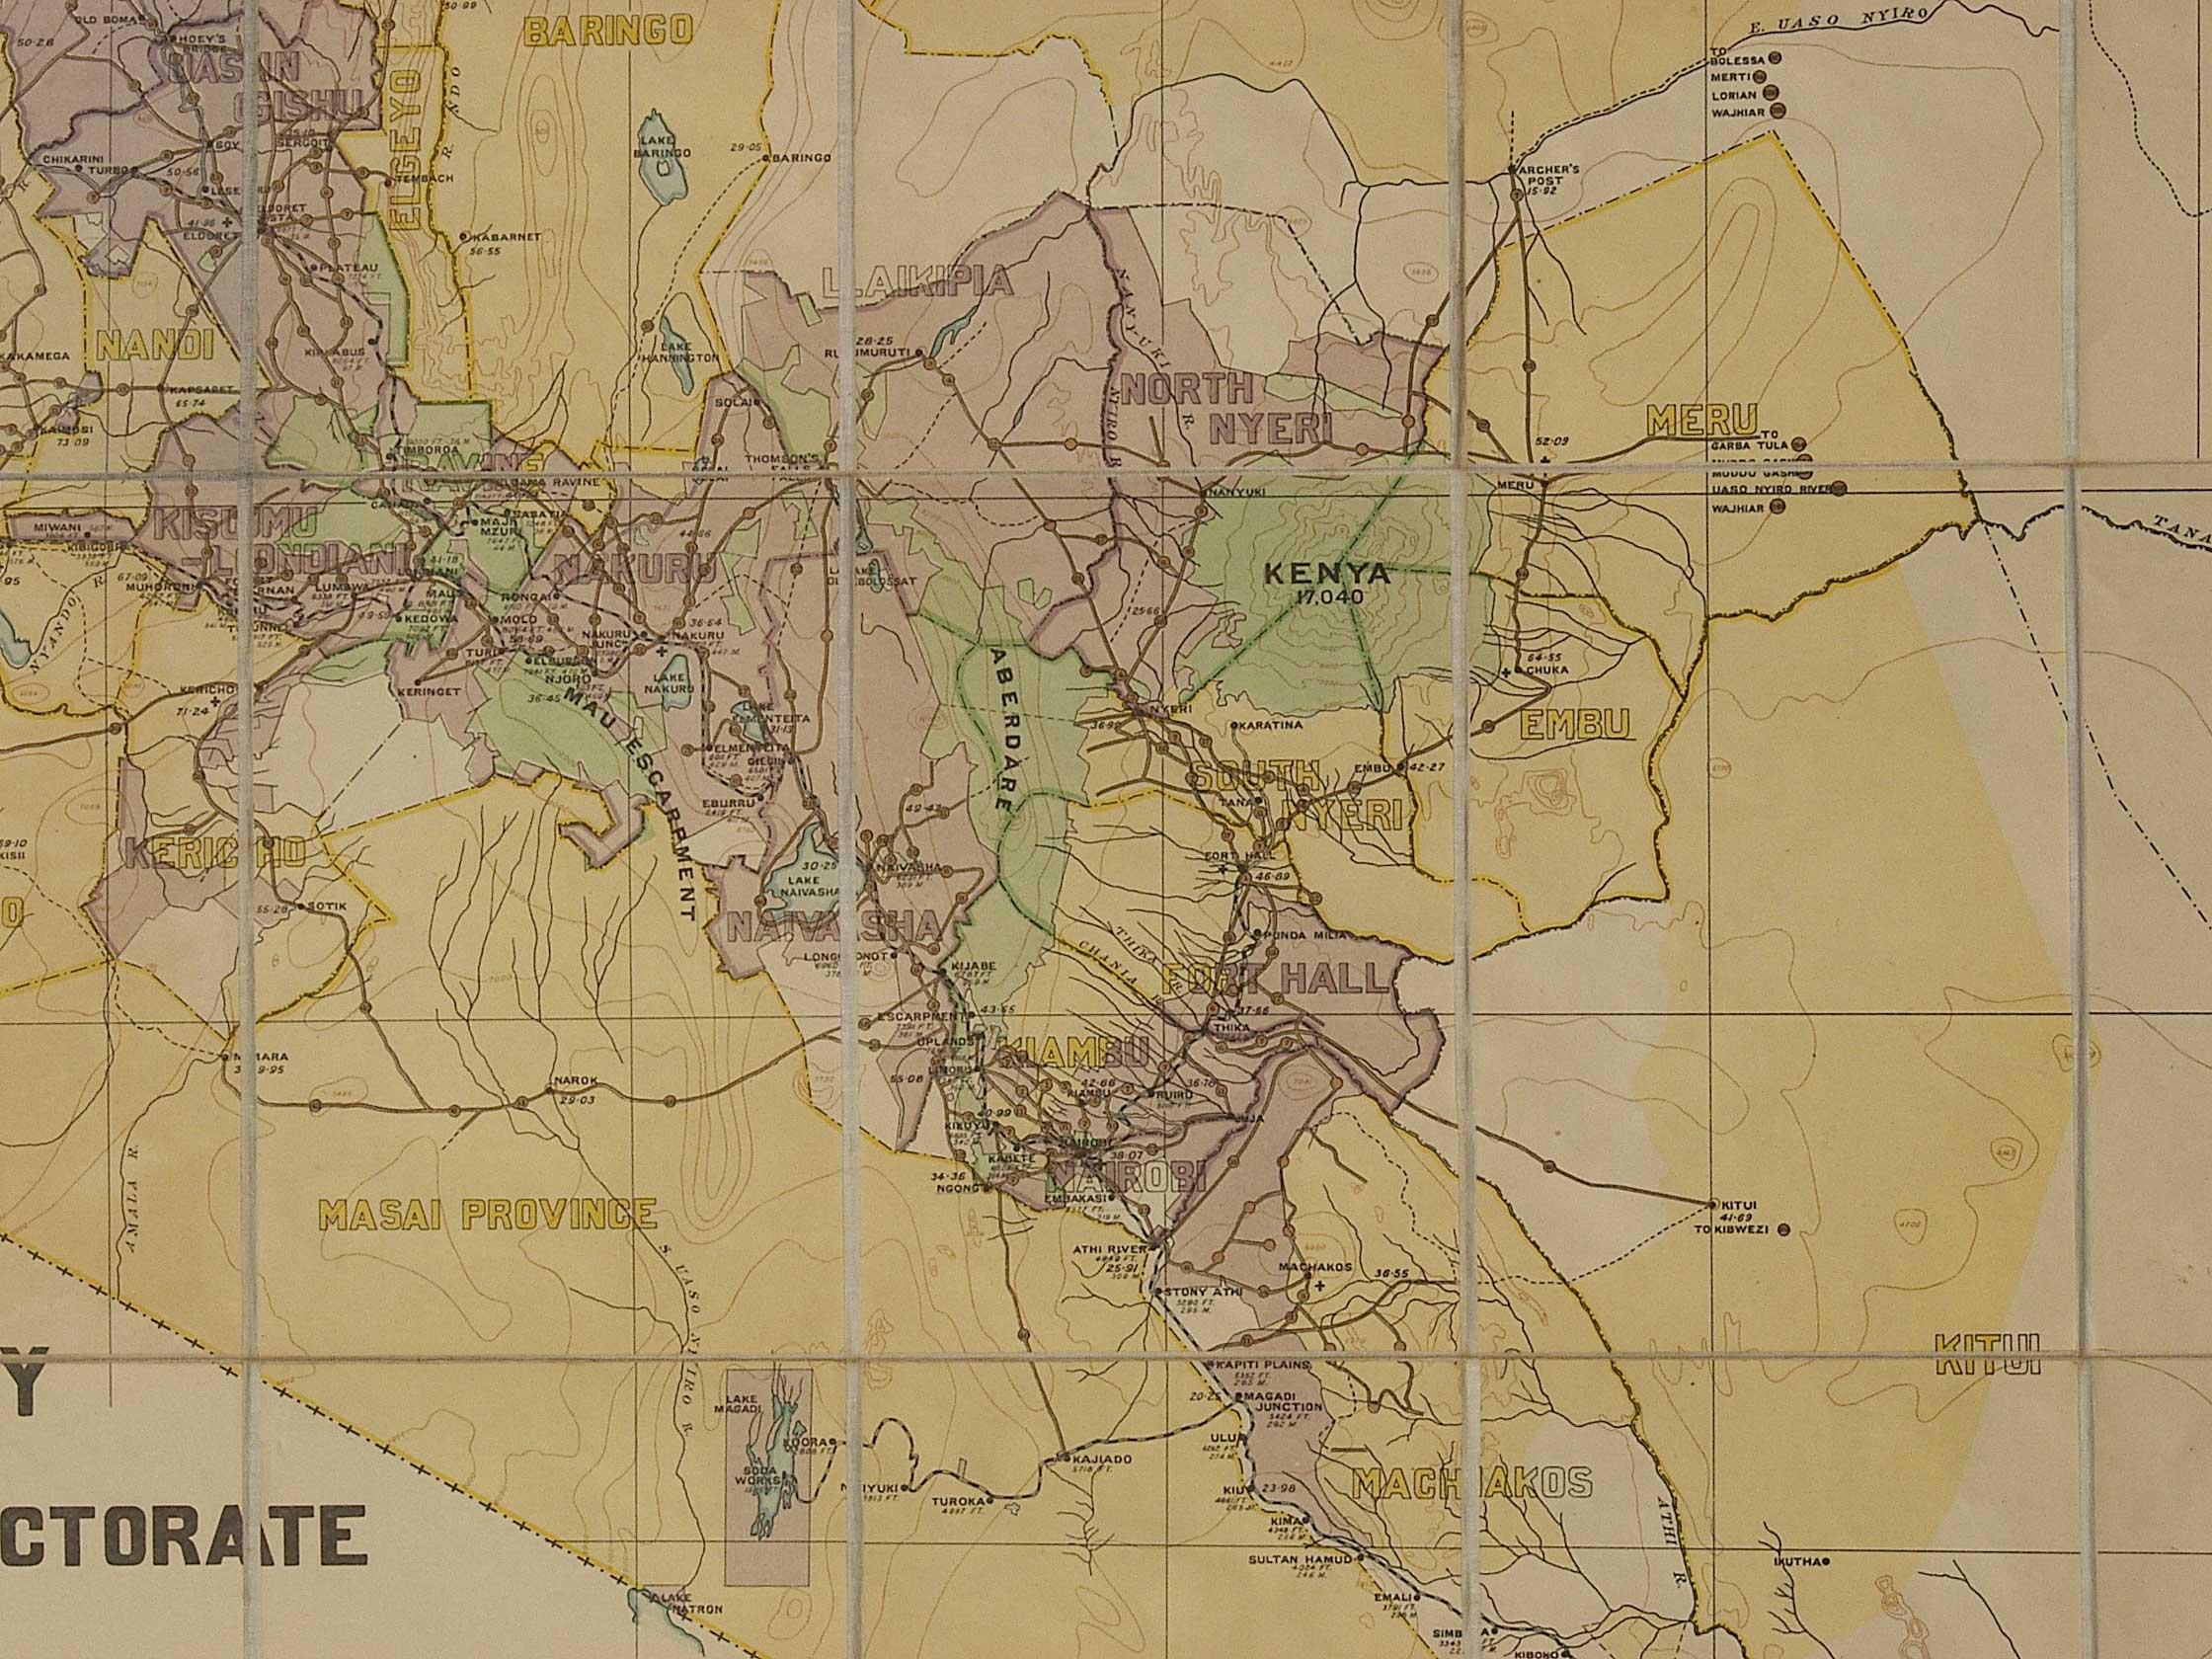 Whkmla history of kenya detail contemporary central kenya 1925 from britishempire gumiabroncs Choice Image